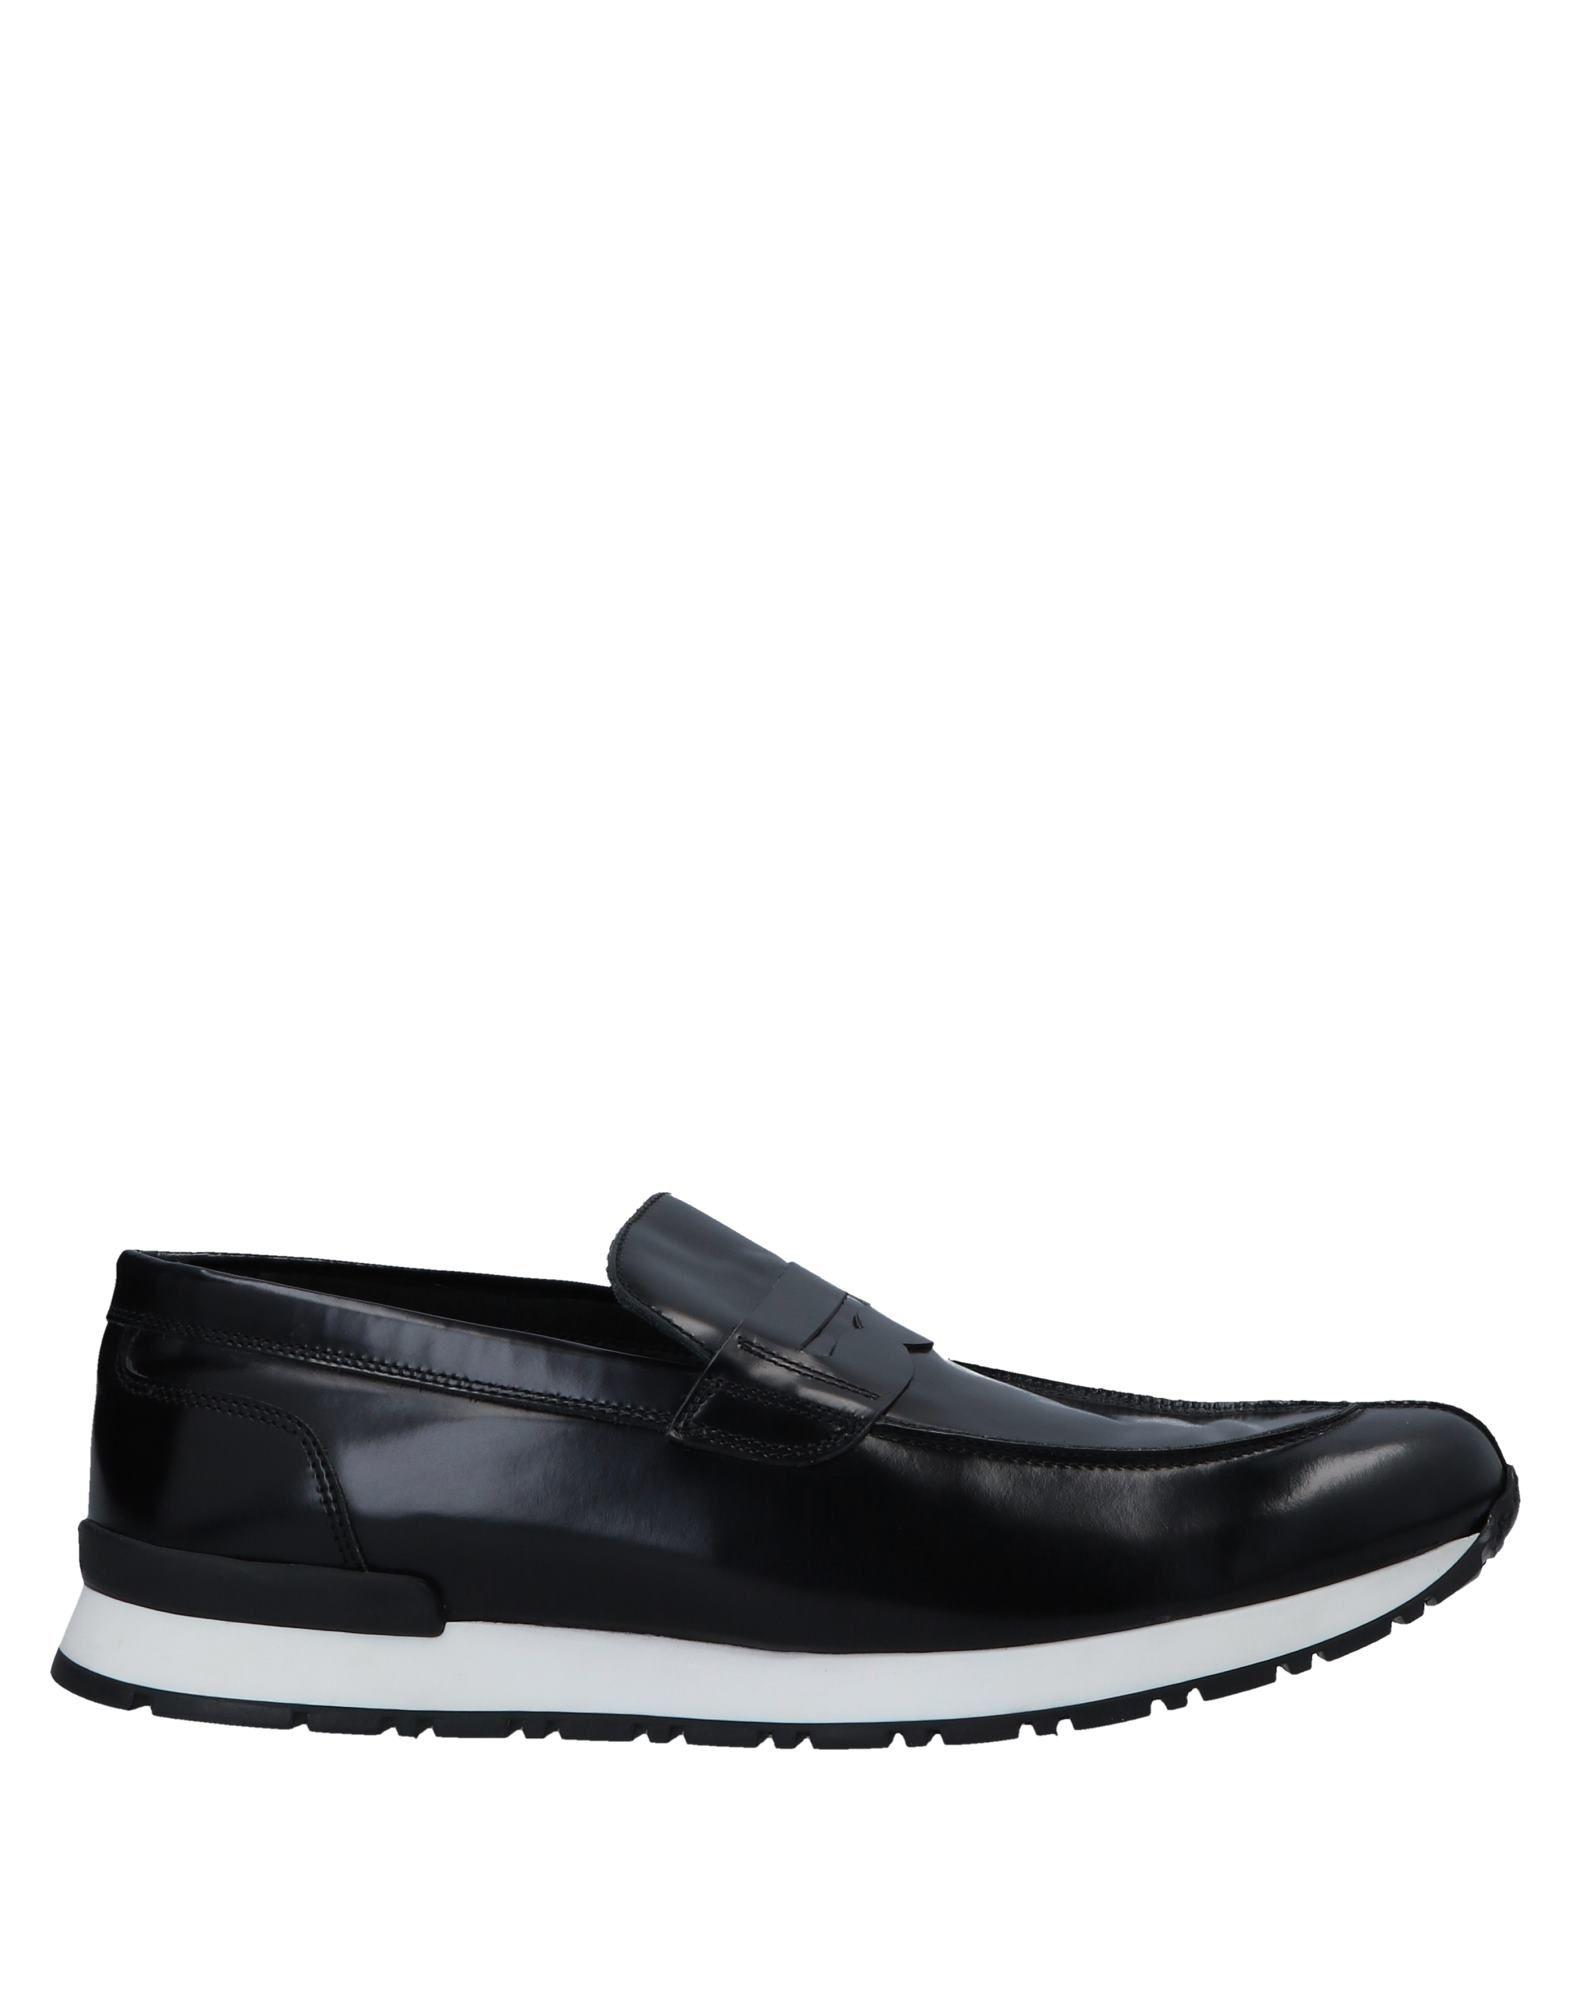 Rabatt echte Schuhe  Gold Brothers Mokassins Herren  Schuhe 11557446EX 6c2d0c